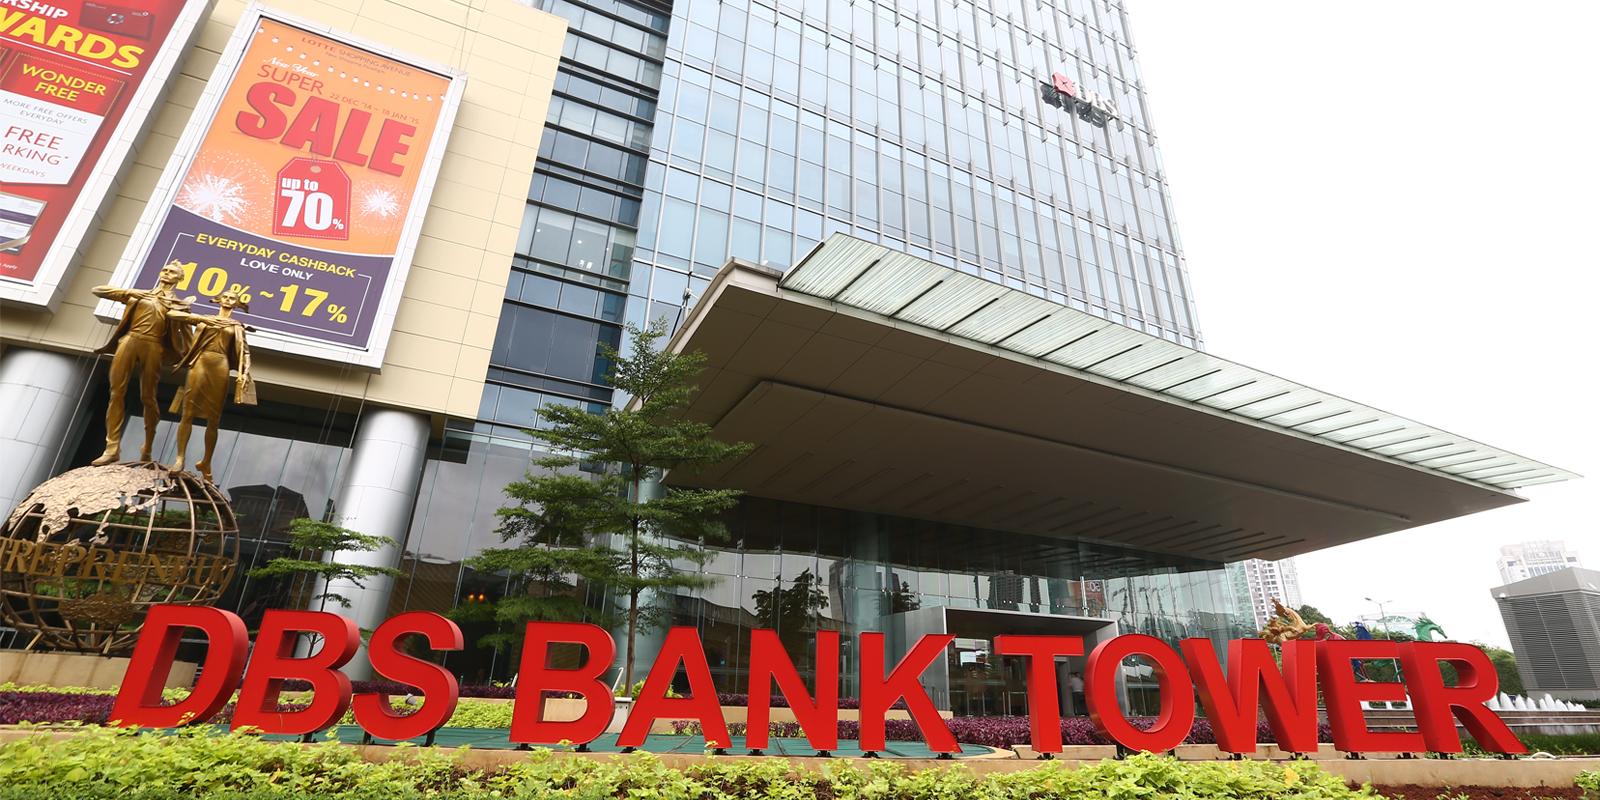 Dbs Bank Tower Lantai 14 Ciputra World 1 Jl Profdrsatrio Kav 3 5 Kuningan Jakarta Selatan